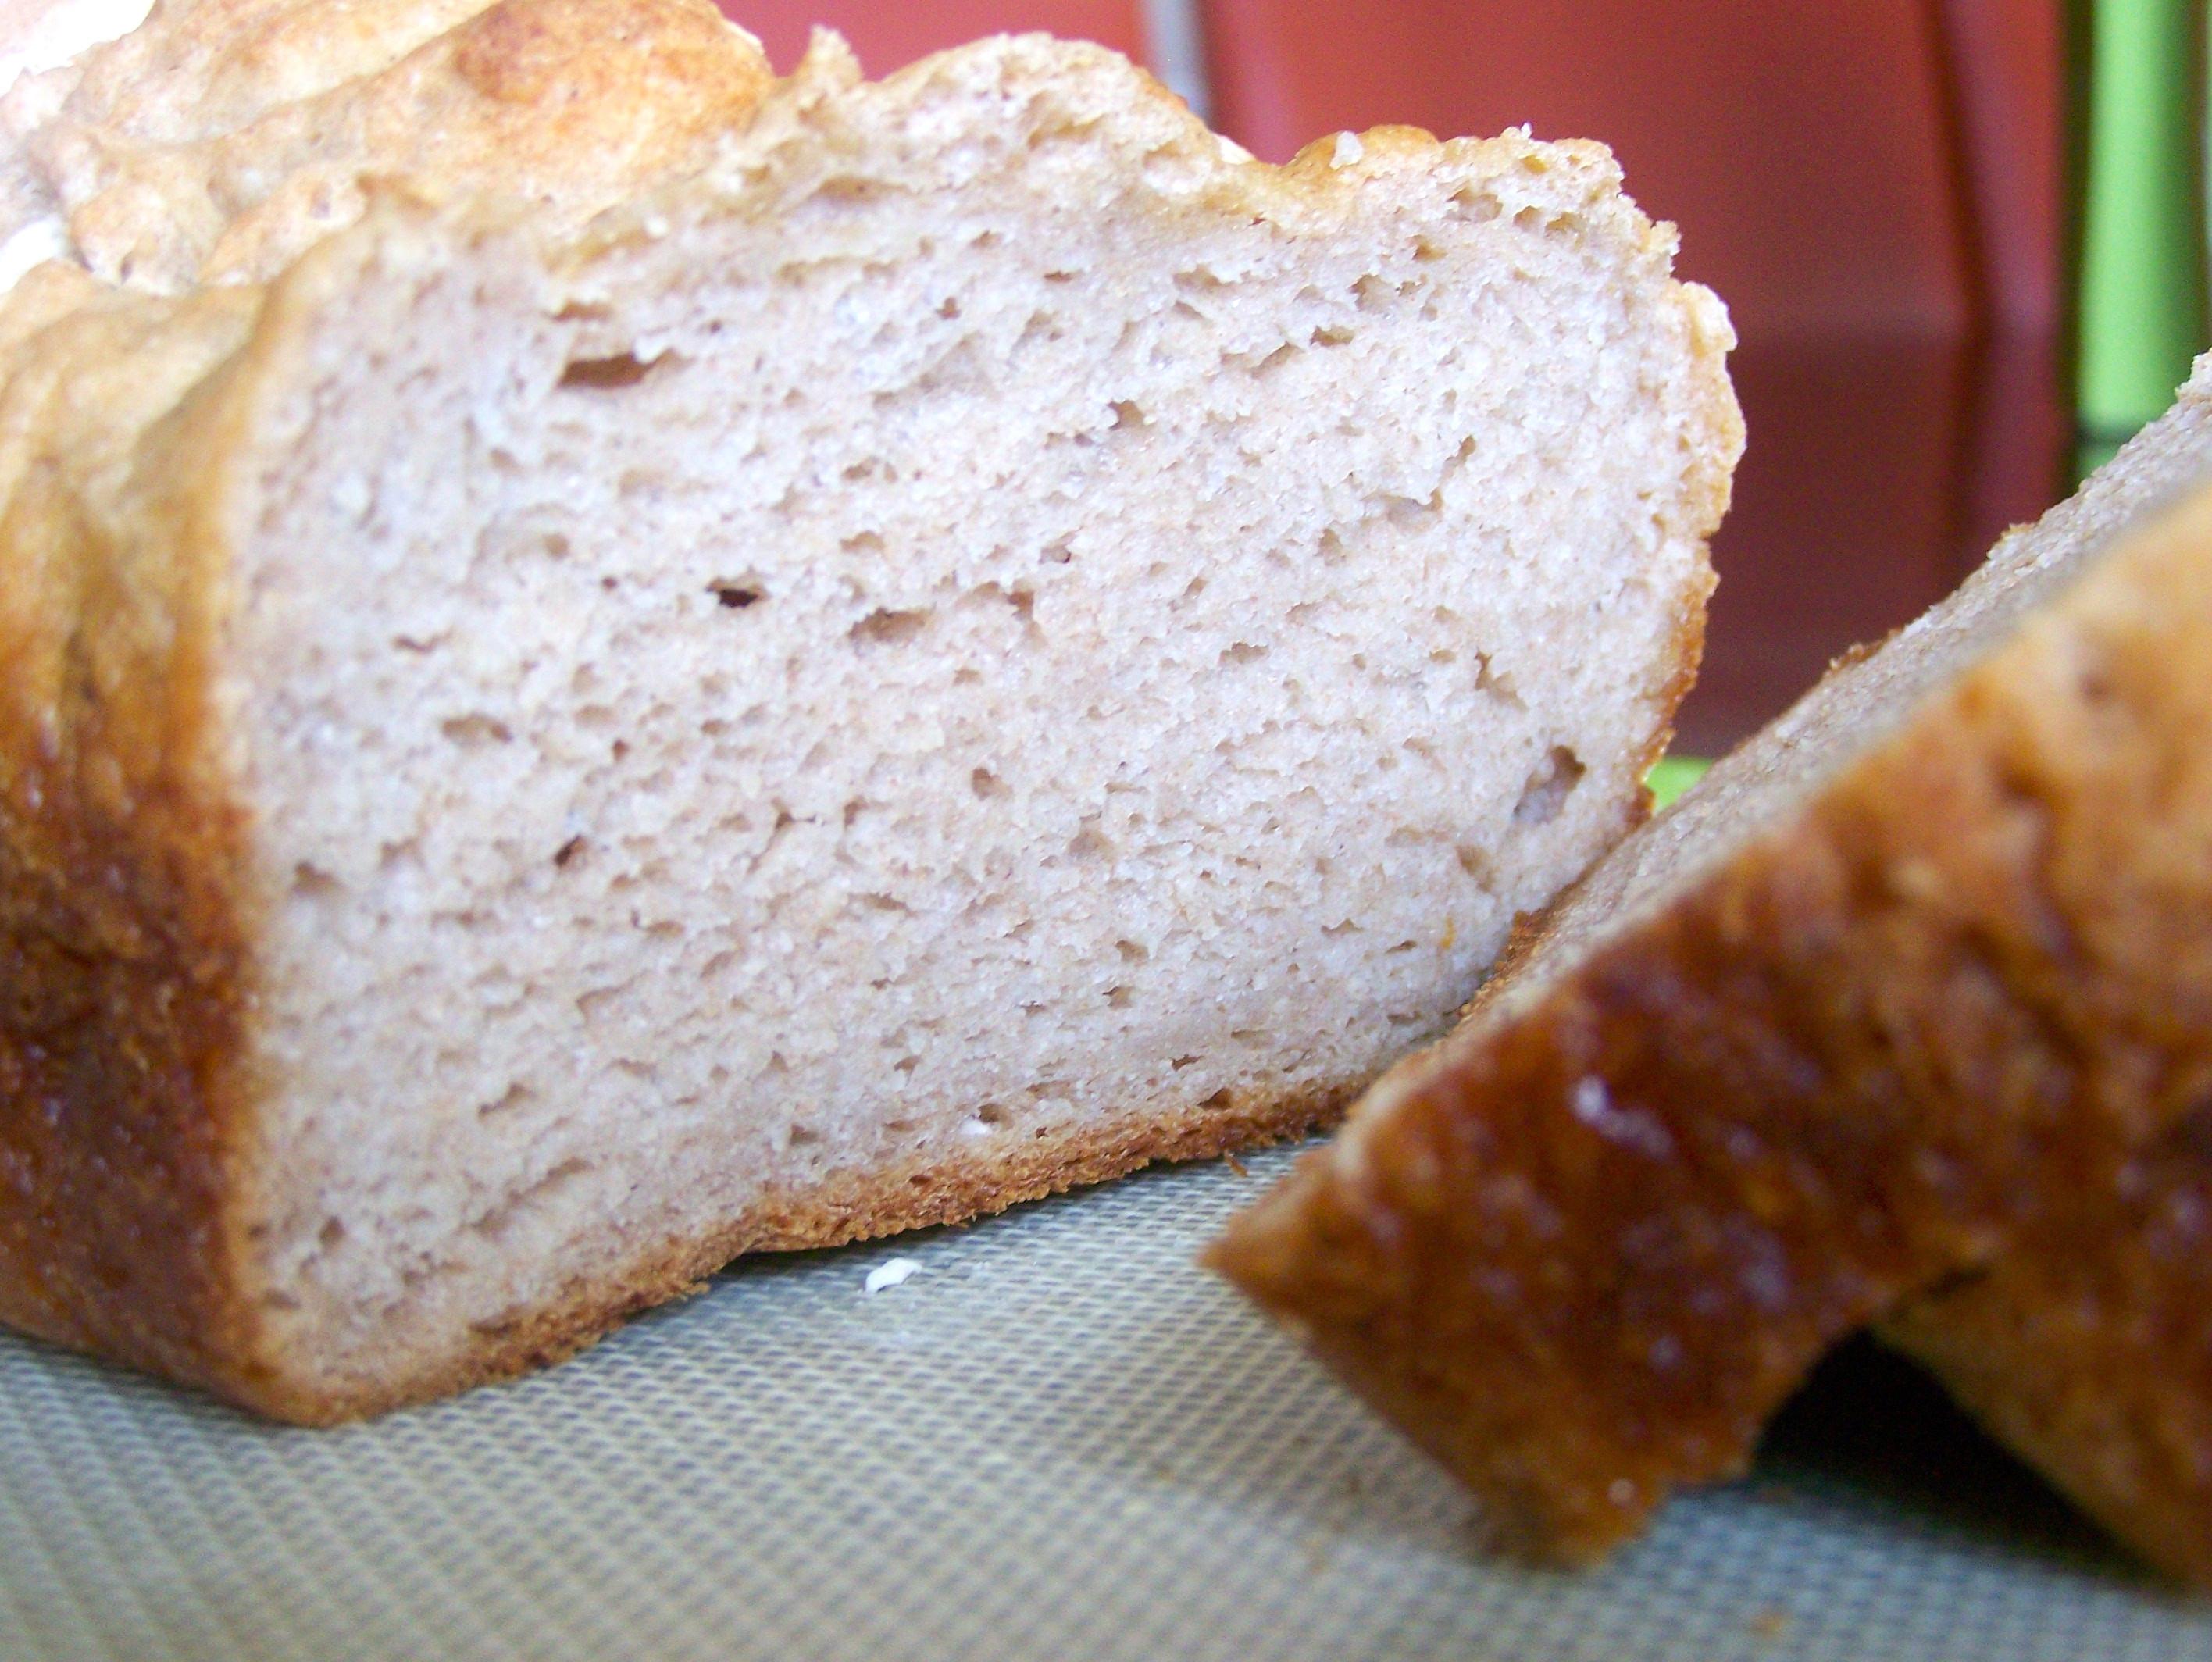 Gluten Free Vegan Bread Brands  Gluten free Vegan bread